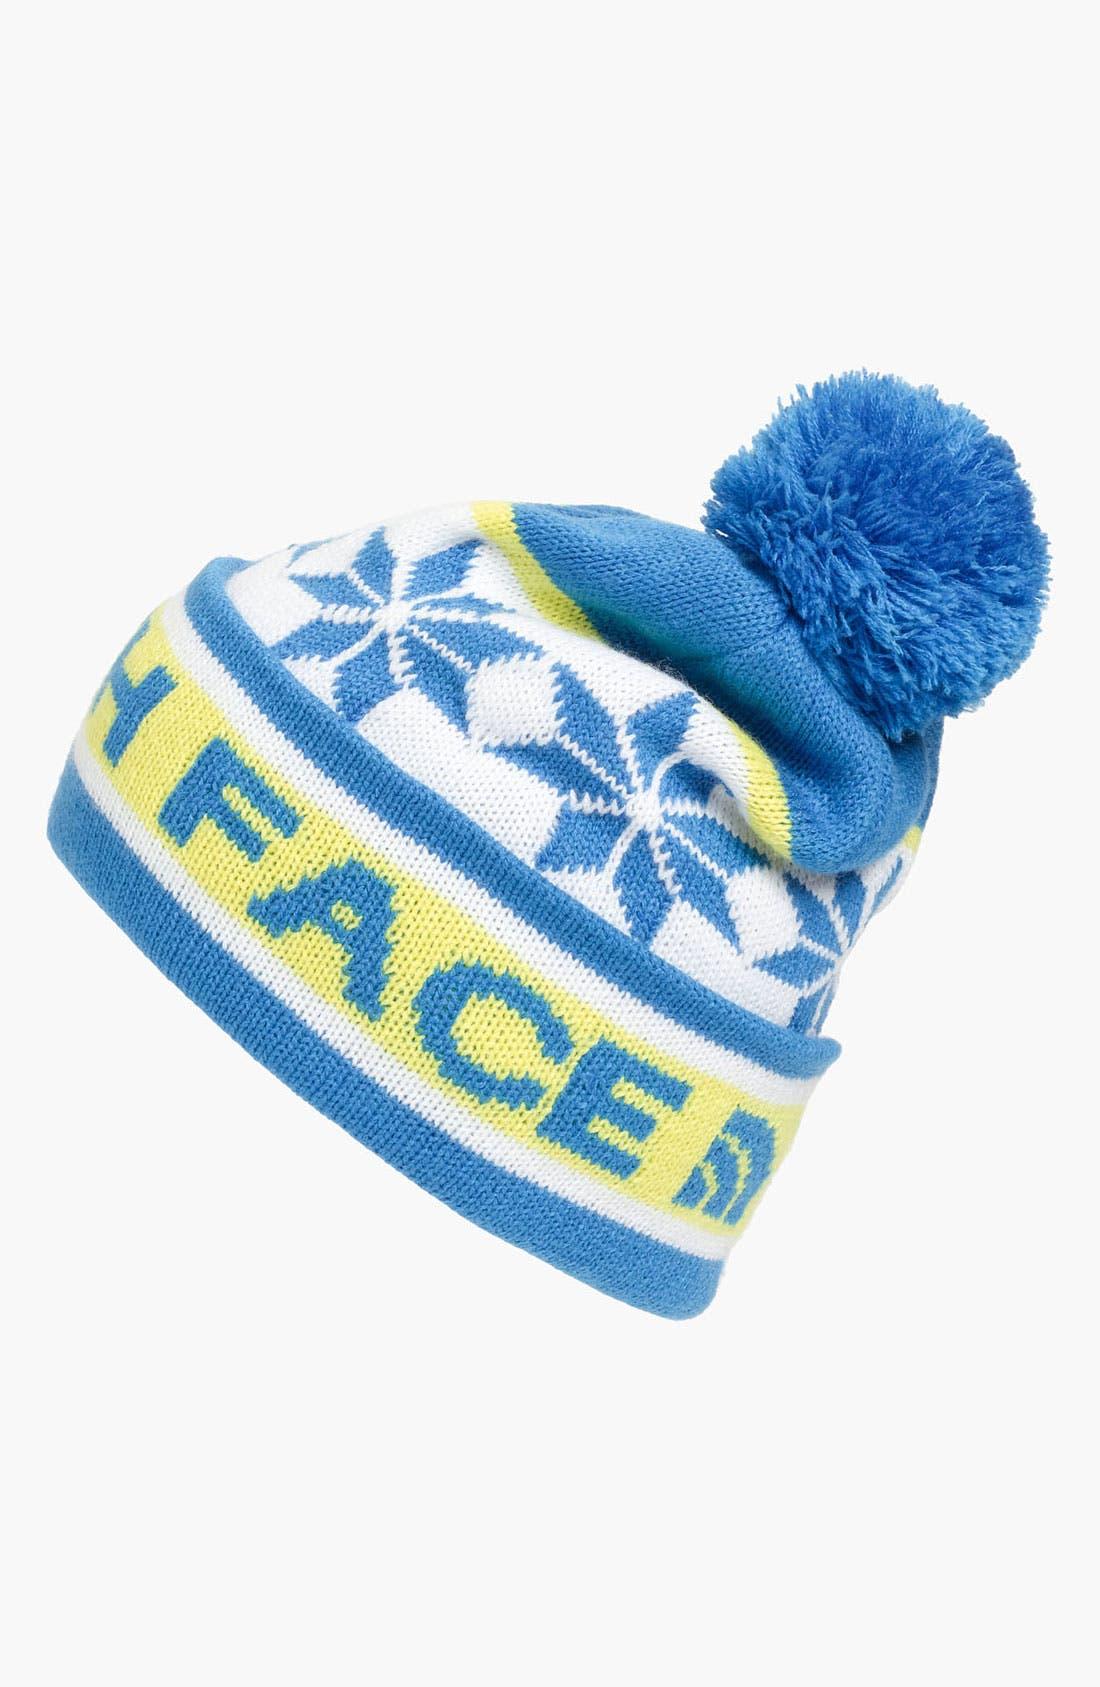 Main Image - The North Face 'Ski Tuque III' Beanie